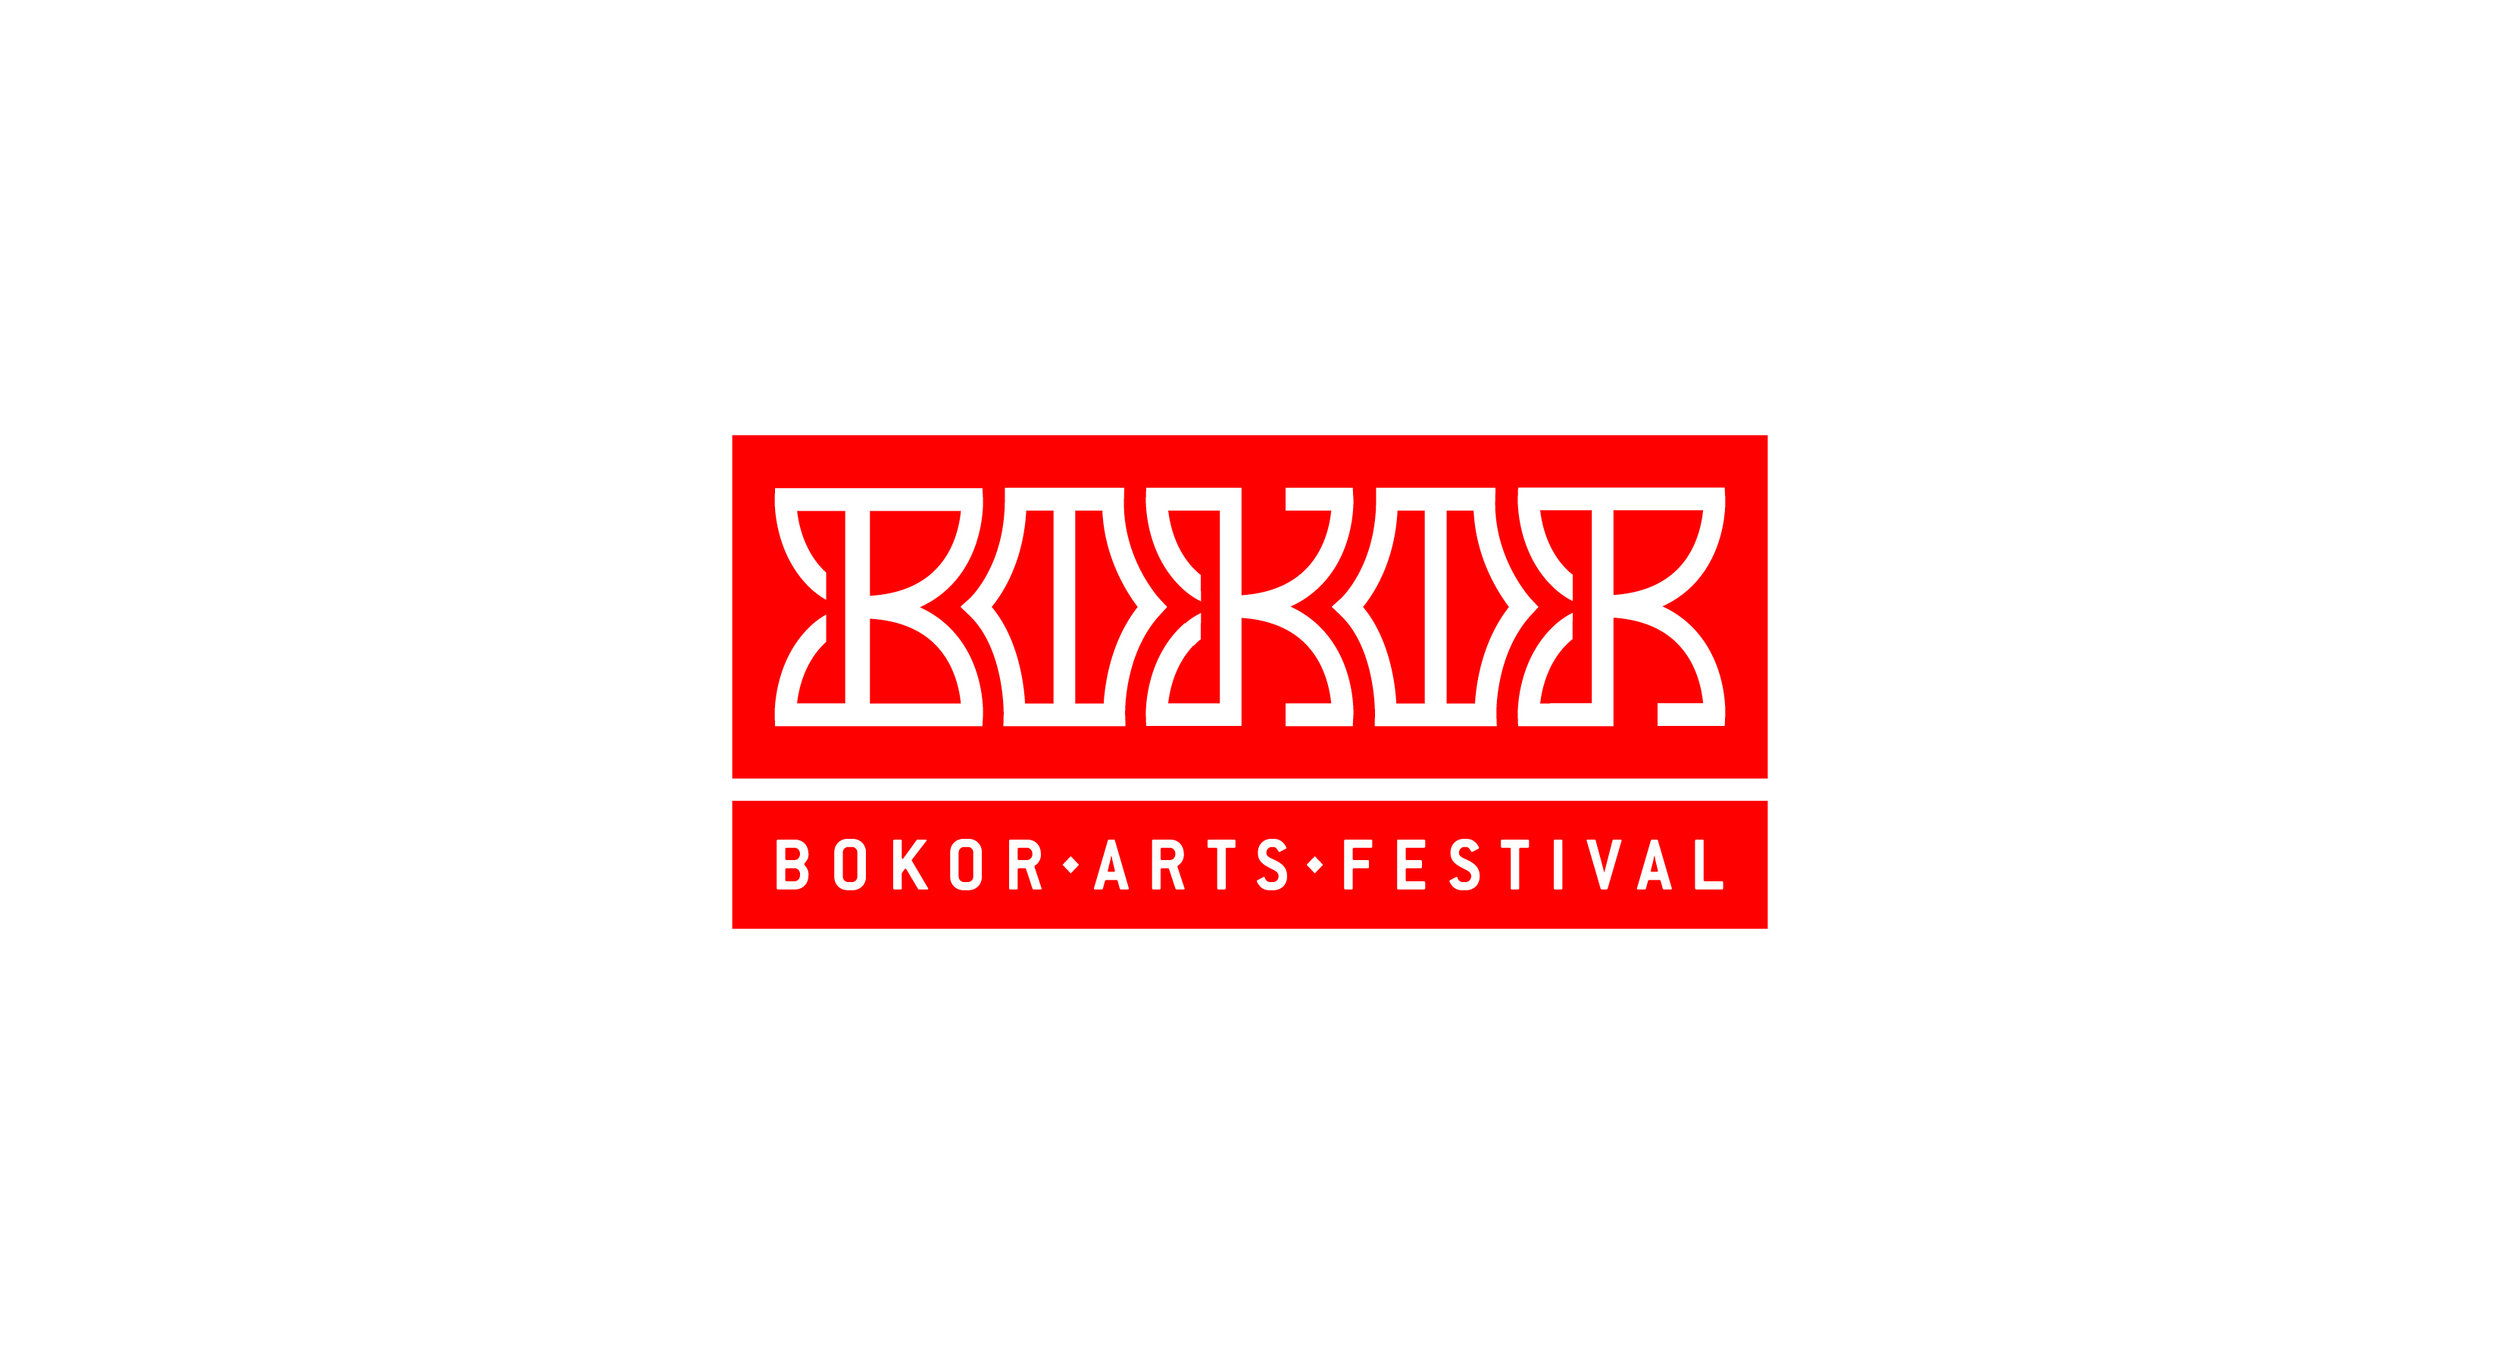 bokor_logo-finals4.jpg